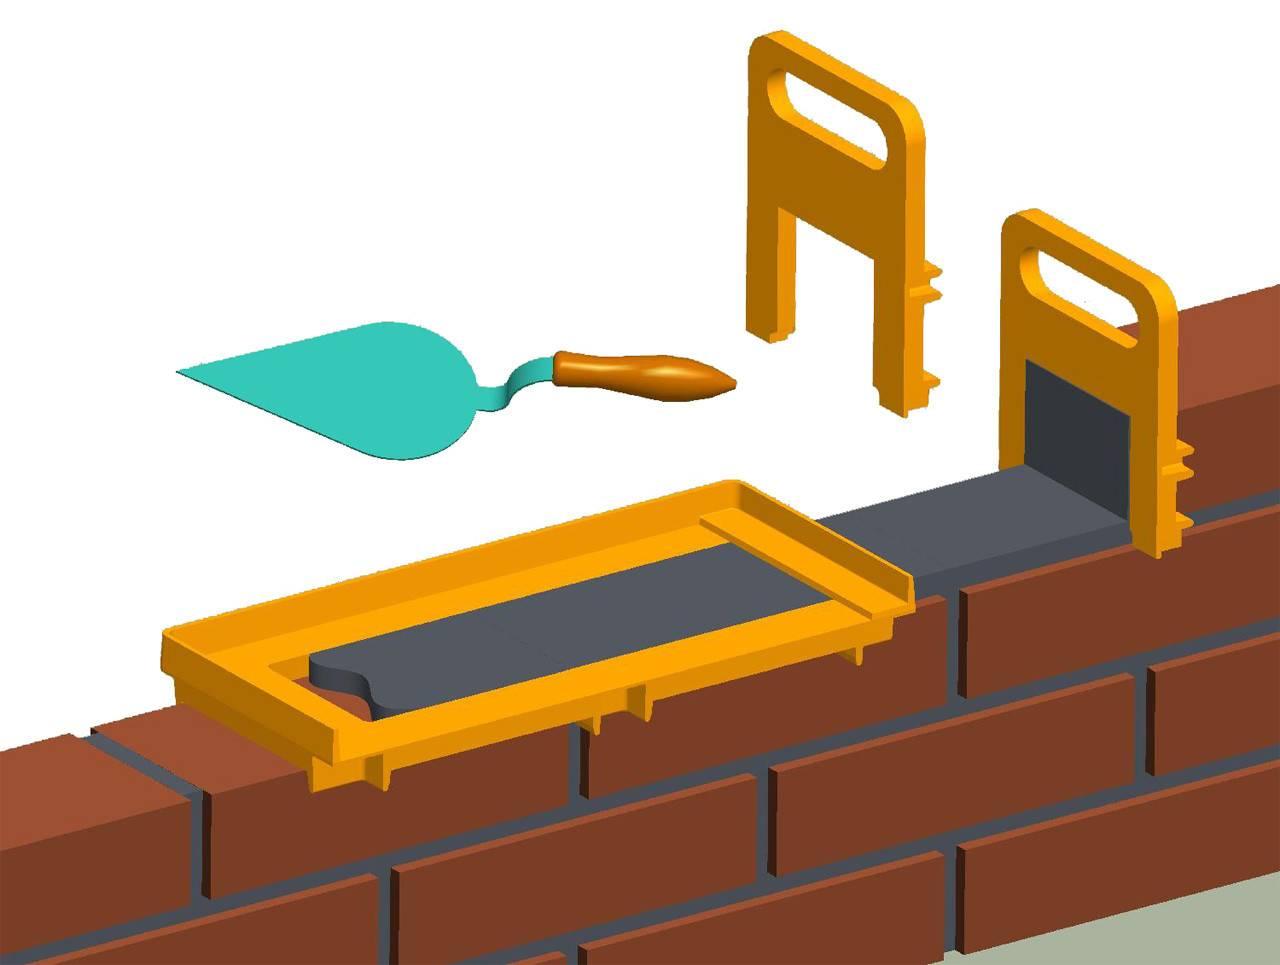 Приспособление для кладки кирпича | (фото & видео)